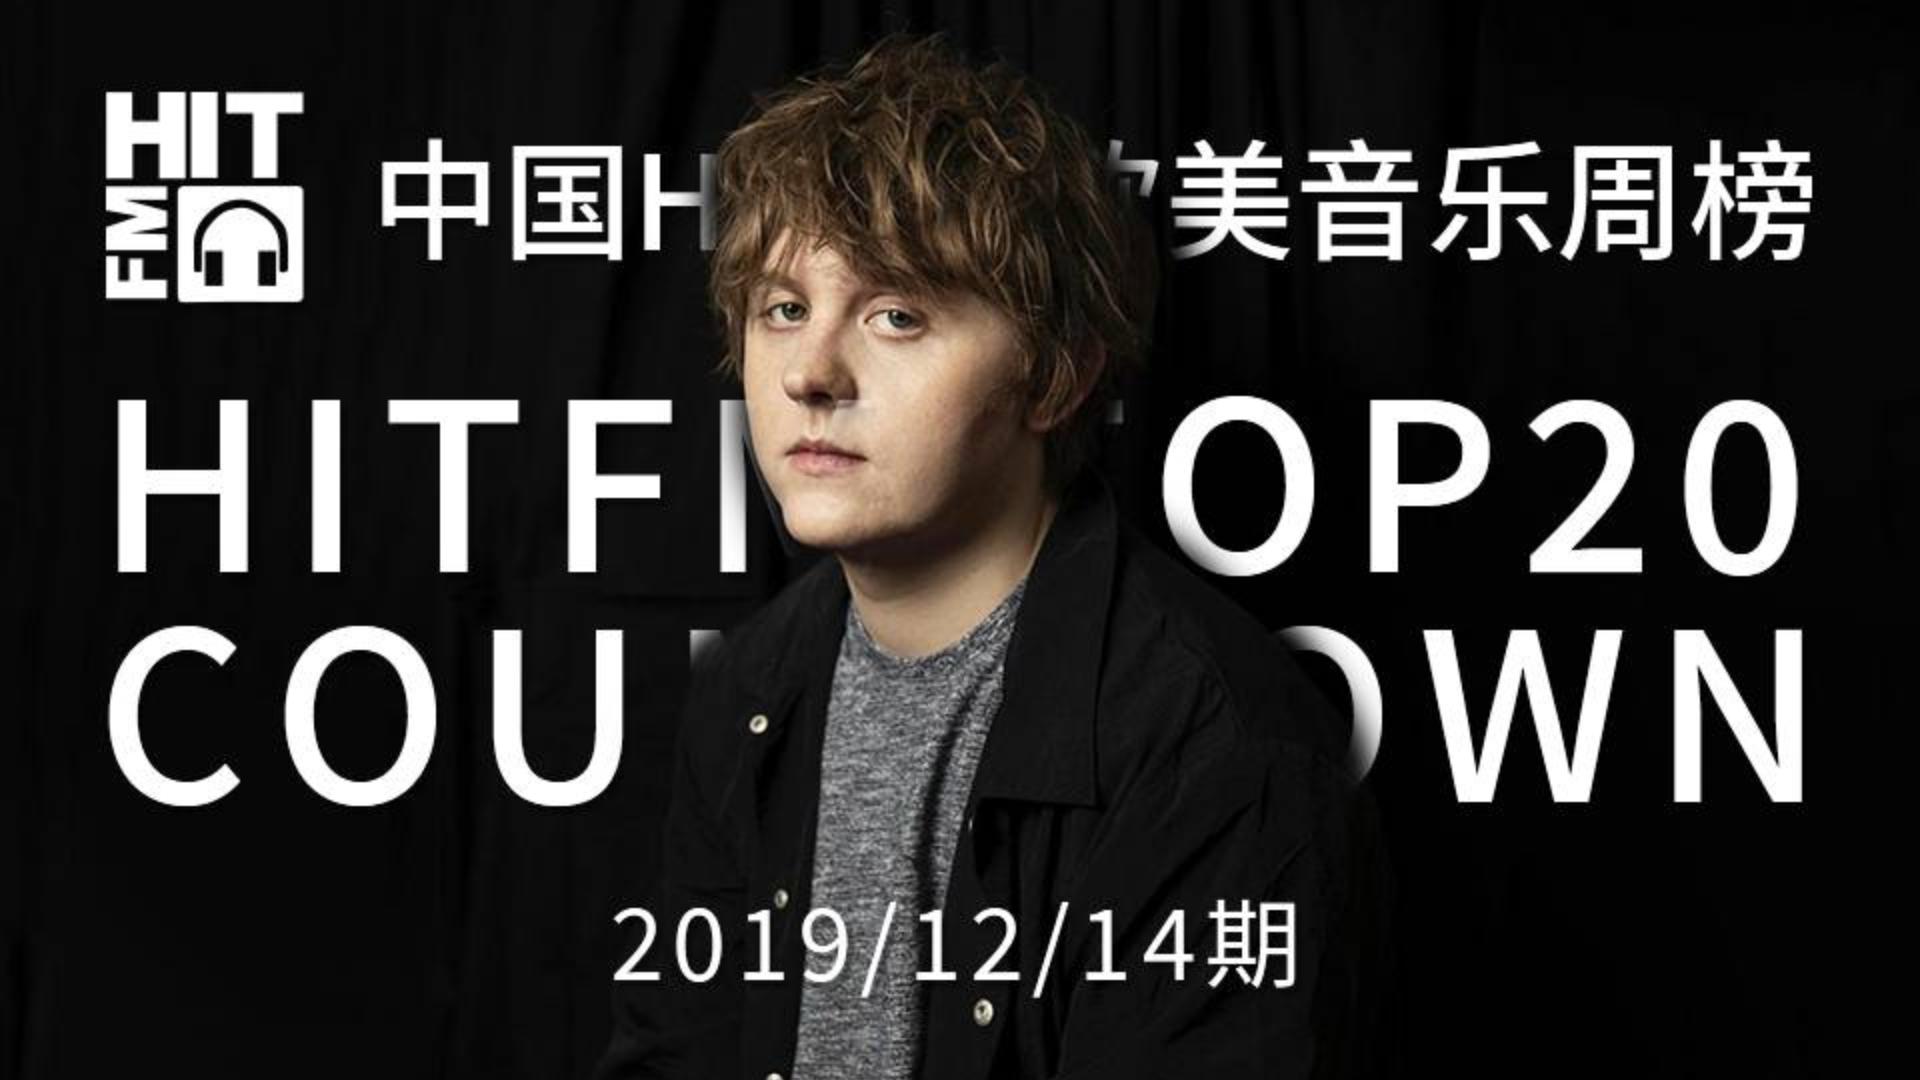 【HITFM】中国HITFM欧美音乐周榜HITFM TOP20 Countdown 20191214